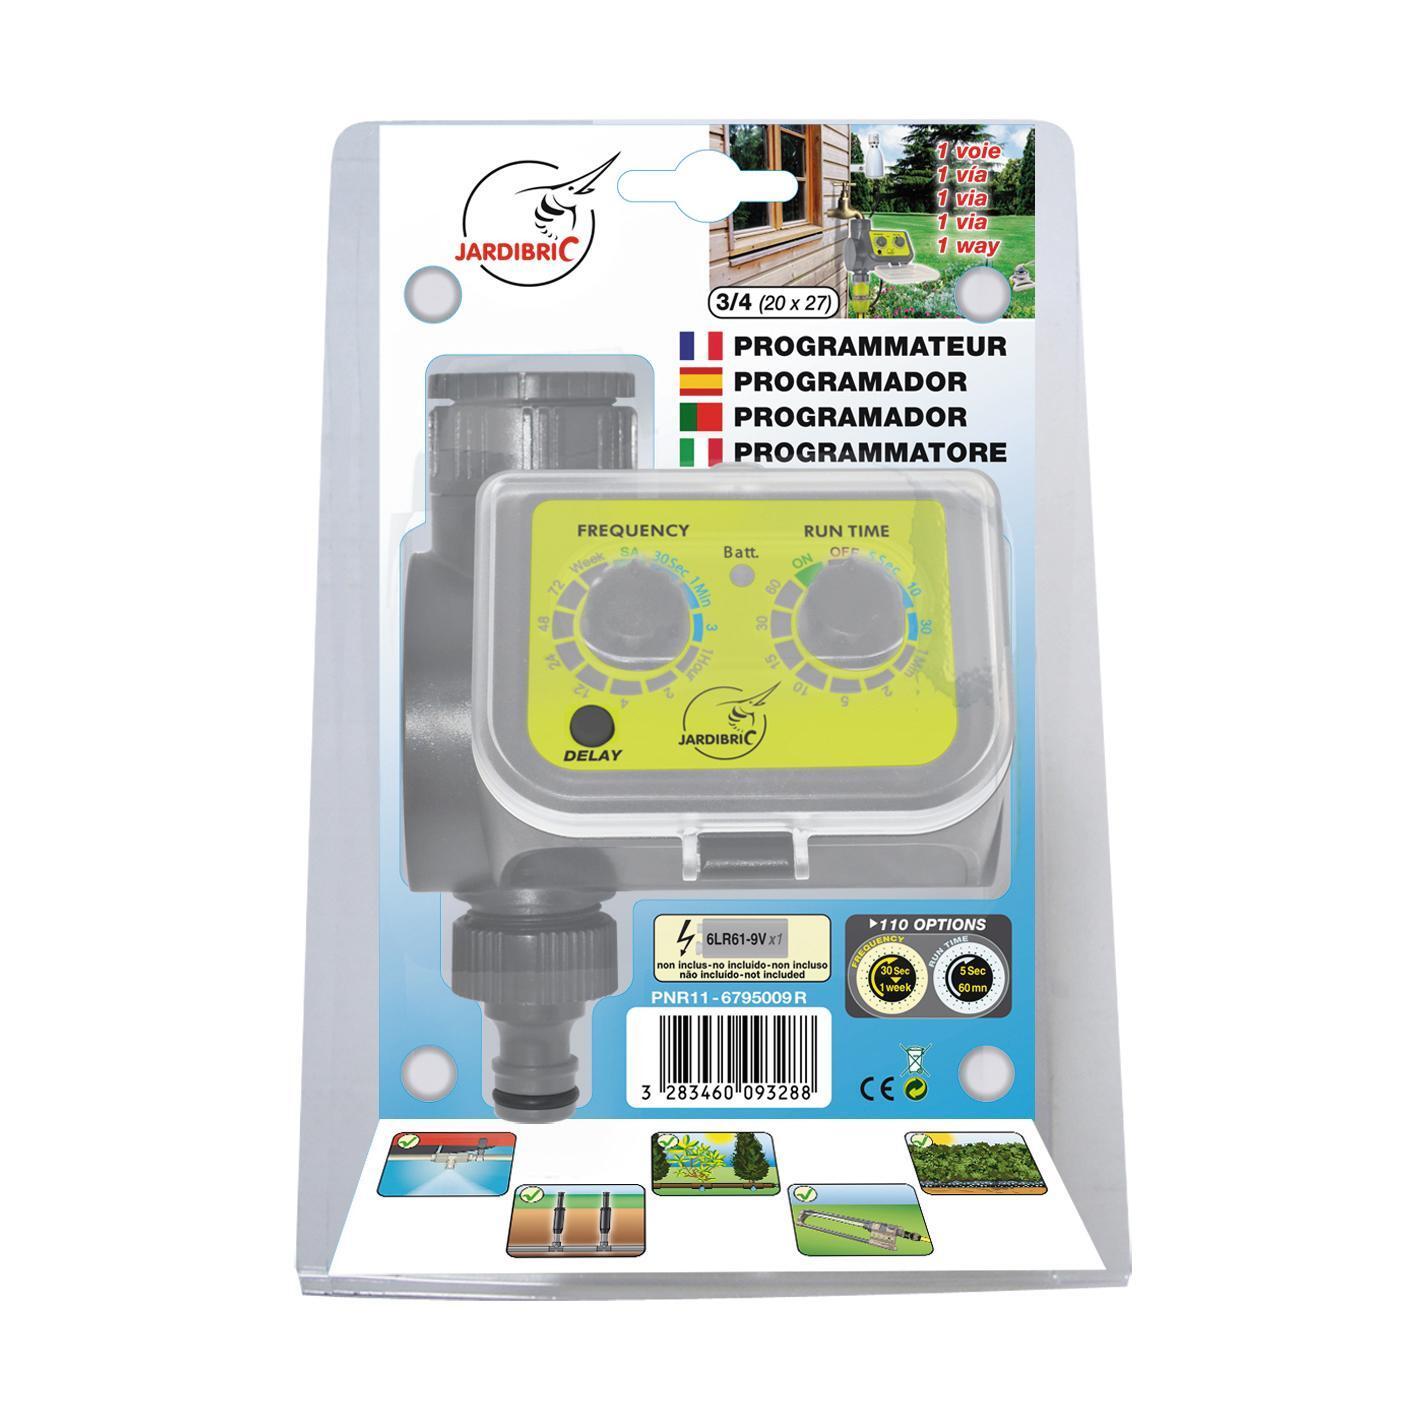 Programmatore da rubinetto batteria JARDIBRIC PNR11 1 via - 3